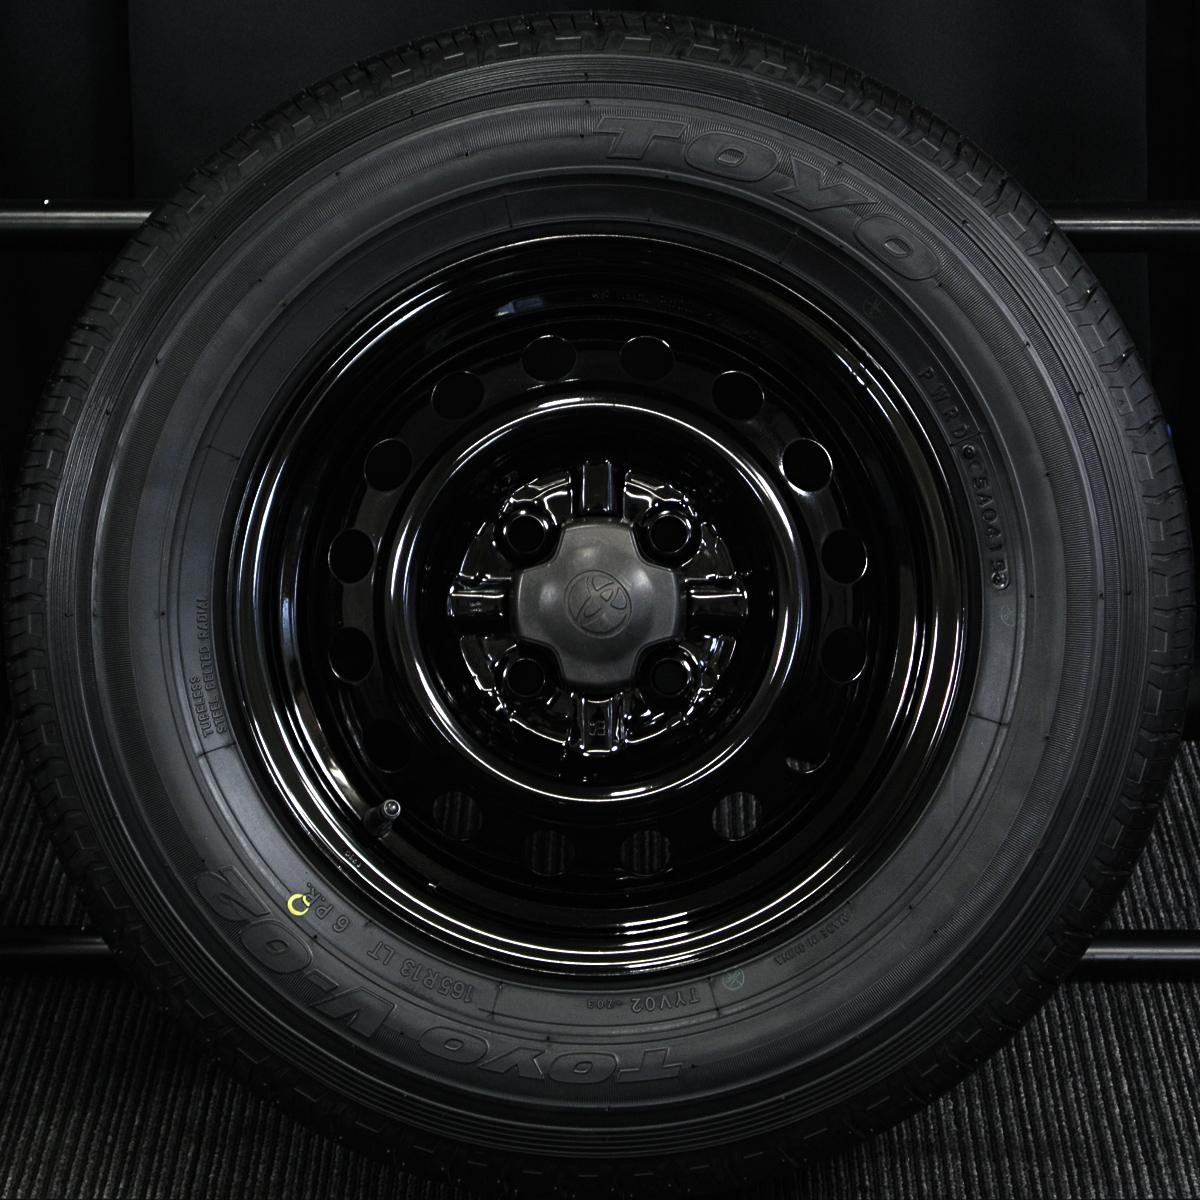 TOYOTA サクシードバン・プロボックスバン 純正 ブラック TOYO V-02 165R13LT 6PR 4本SET